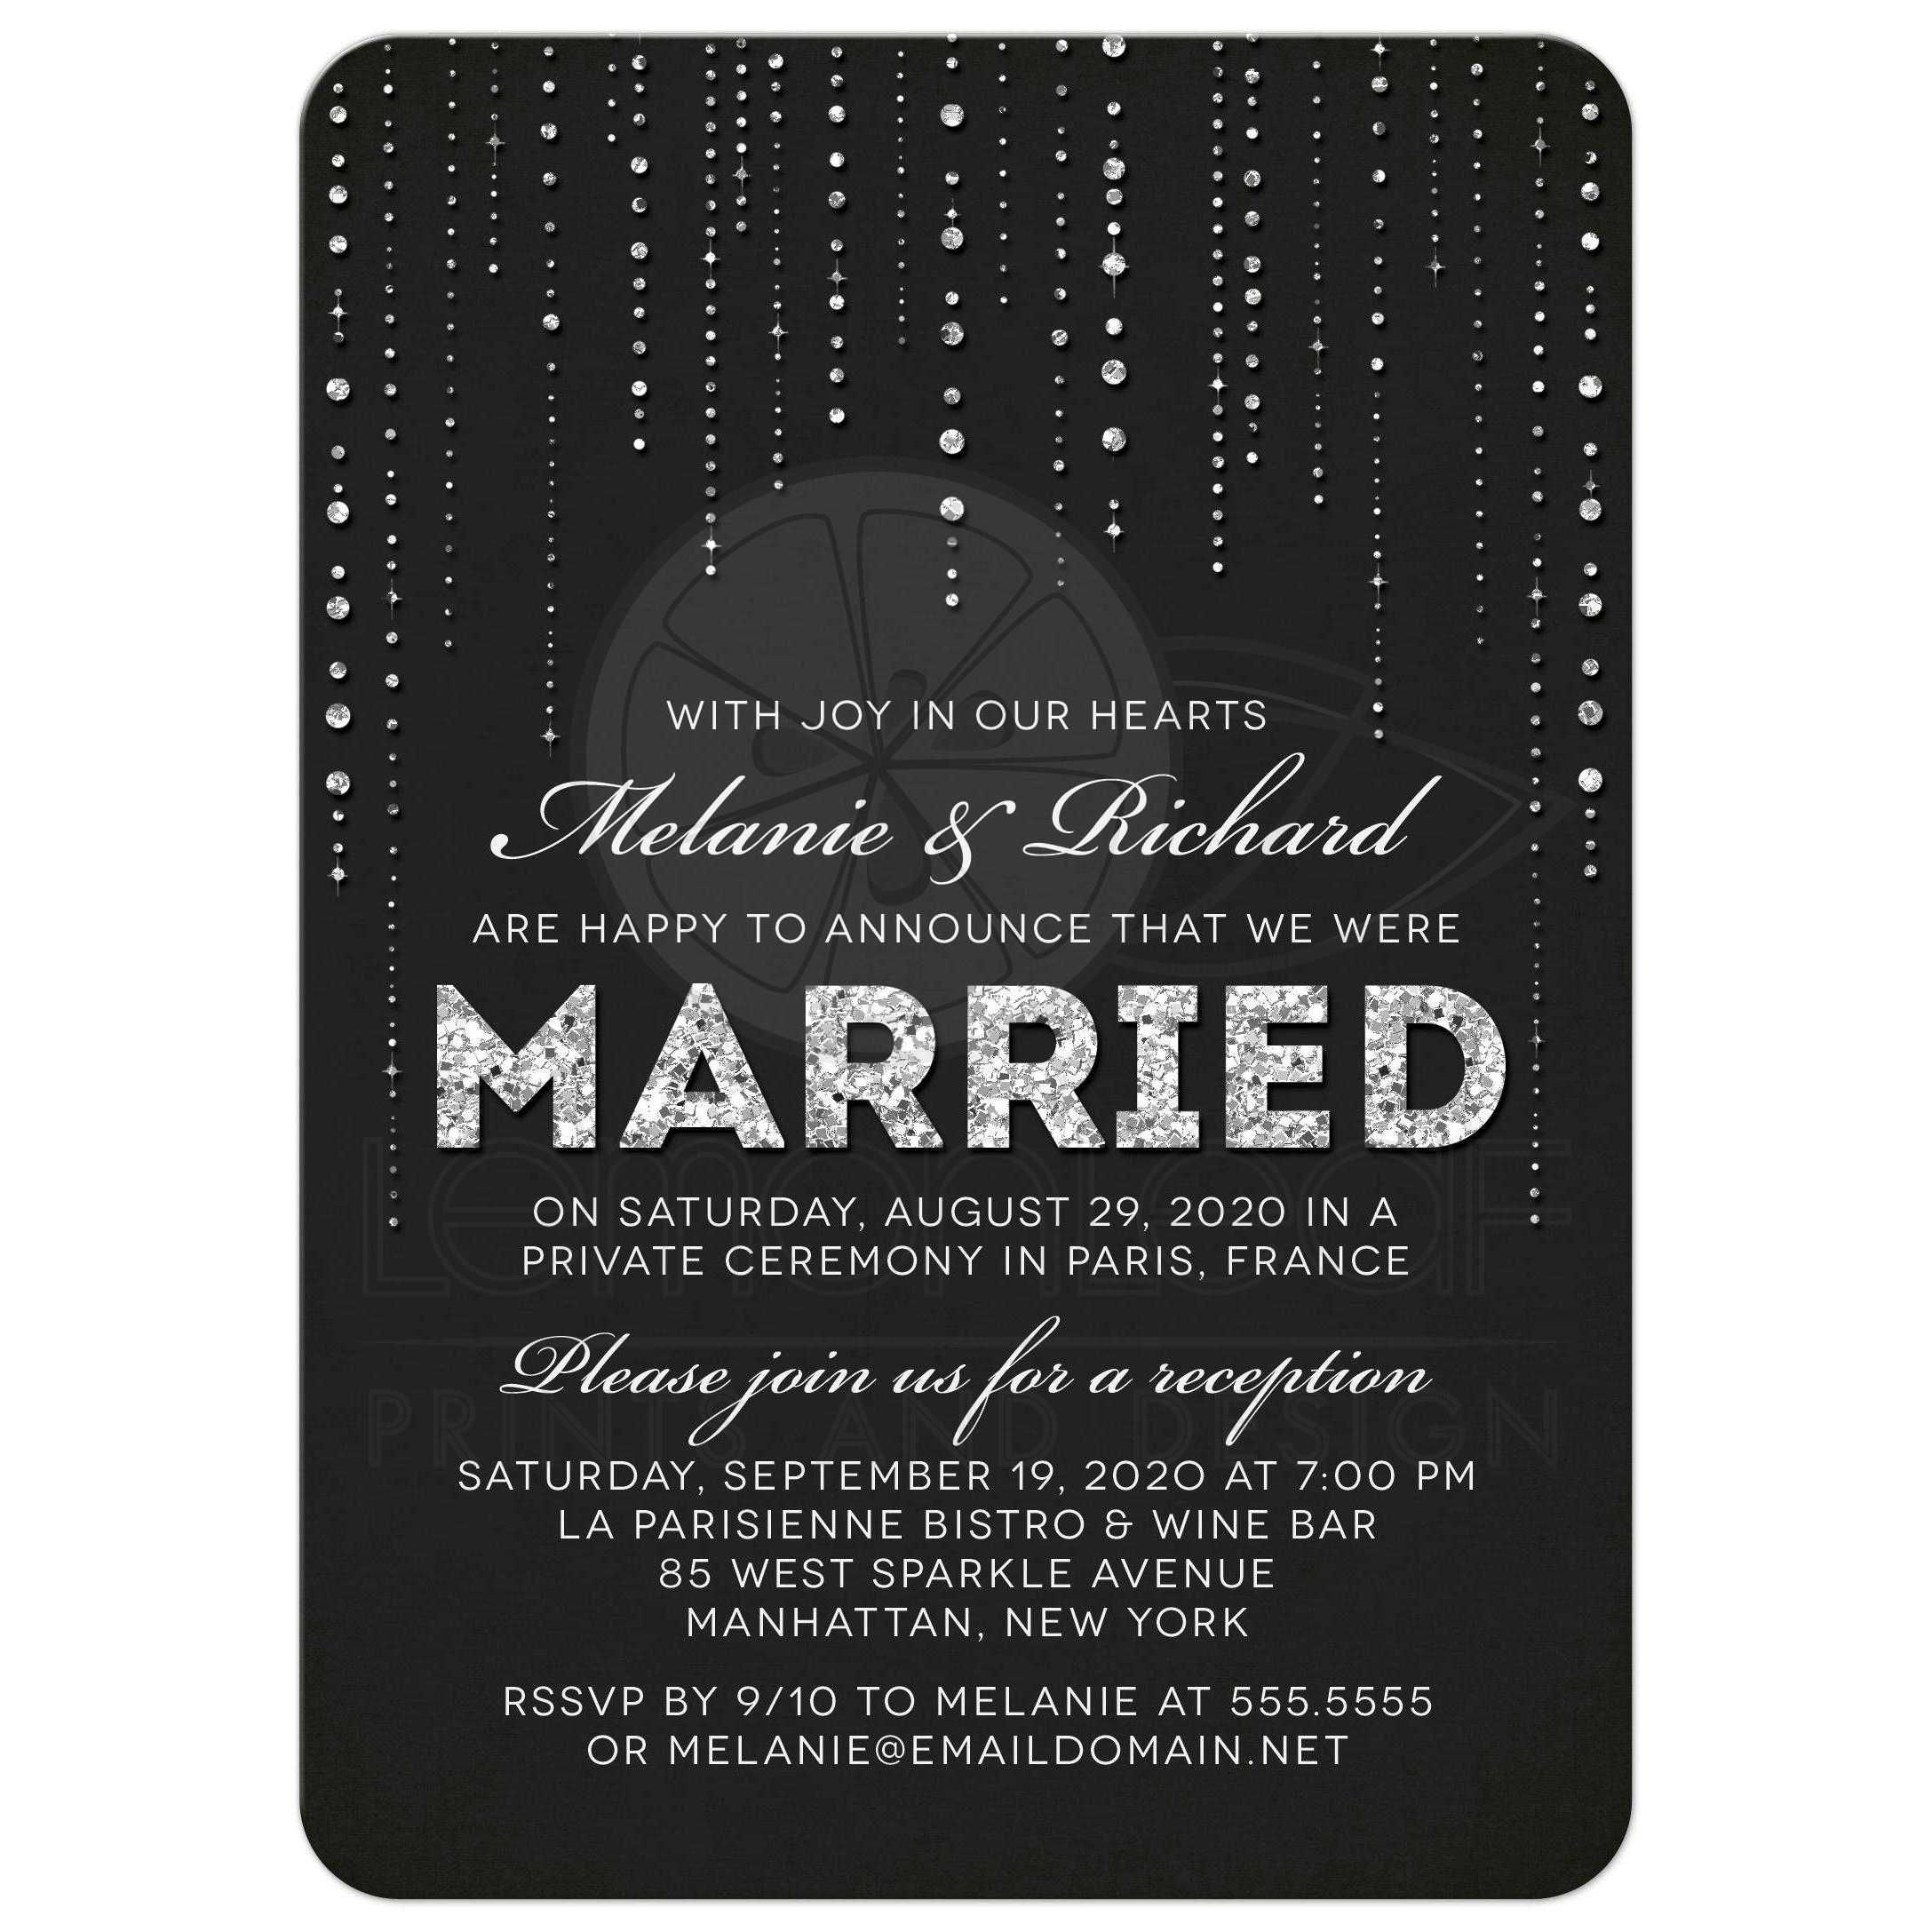 Post Wedding Party Invitation Wording: Post Wedding Reception Only Invitations